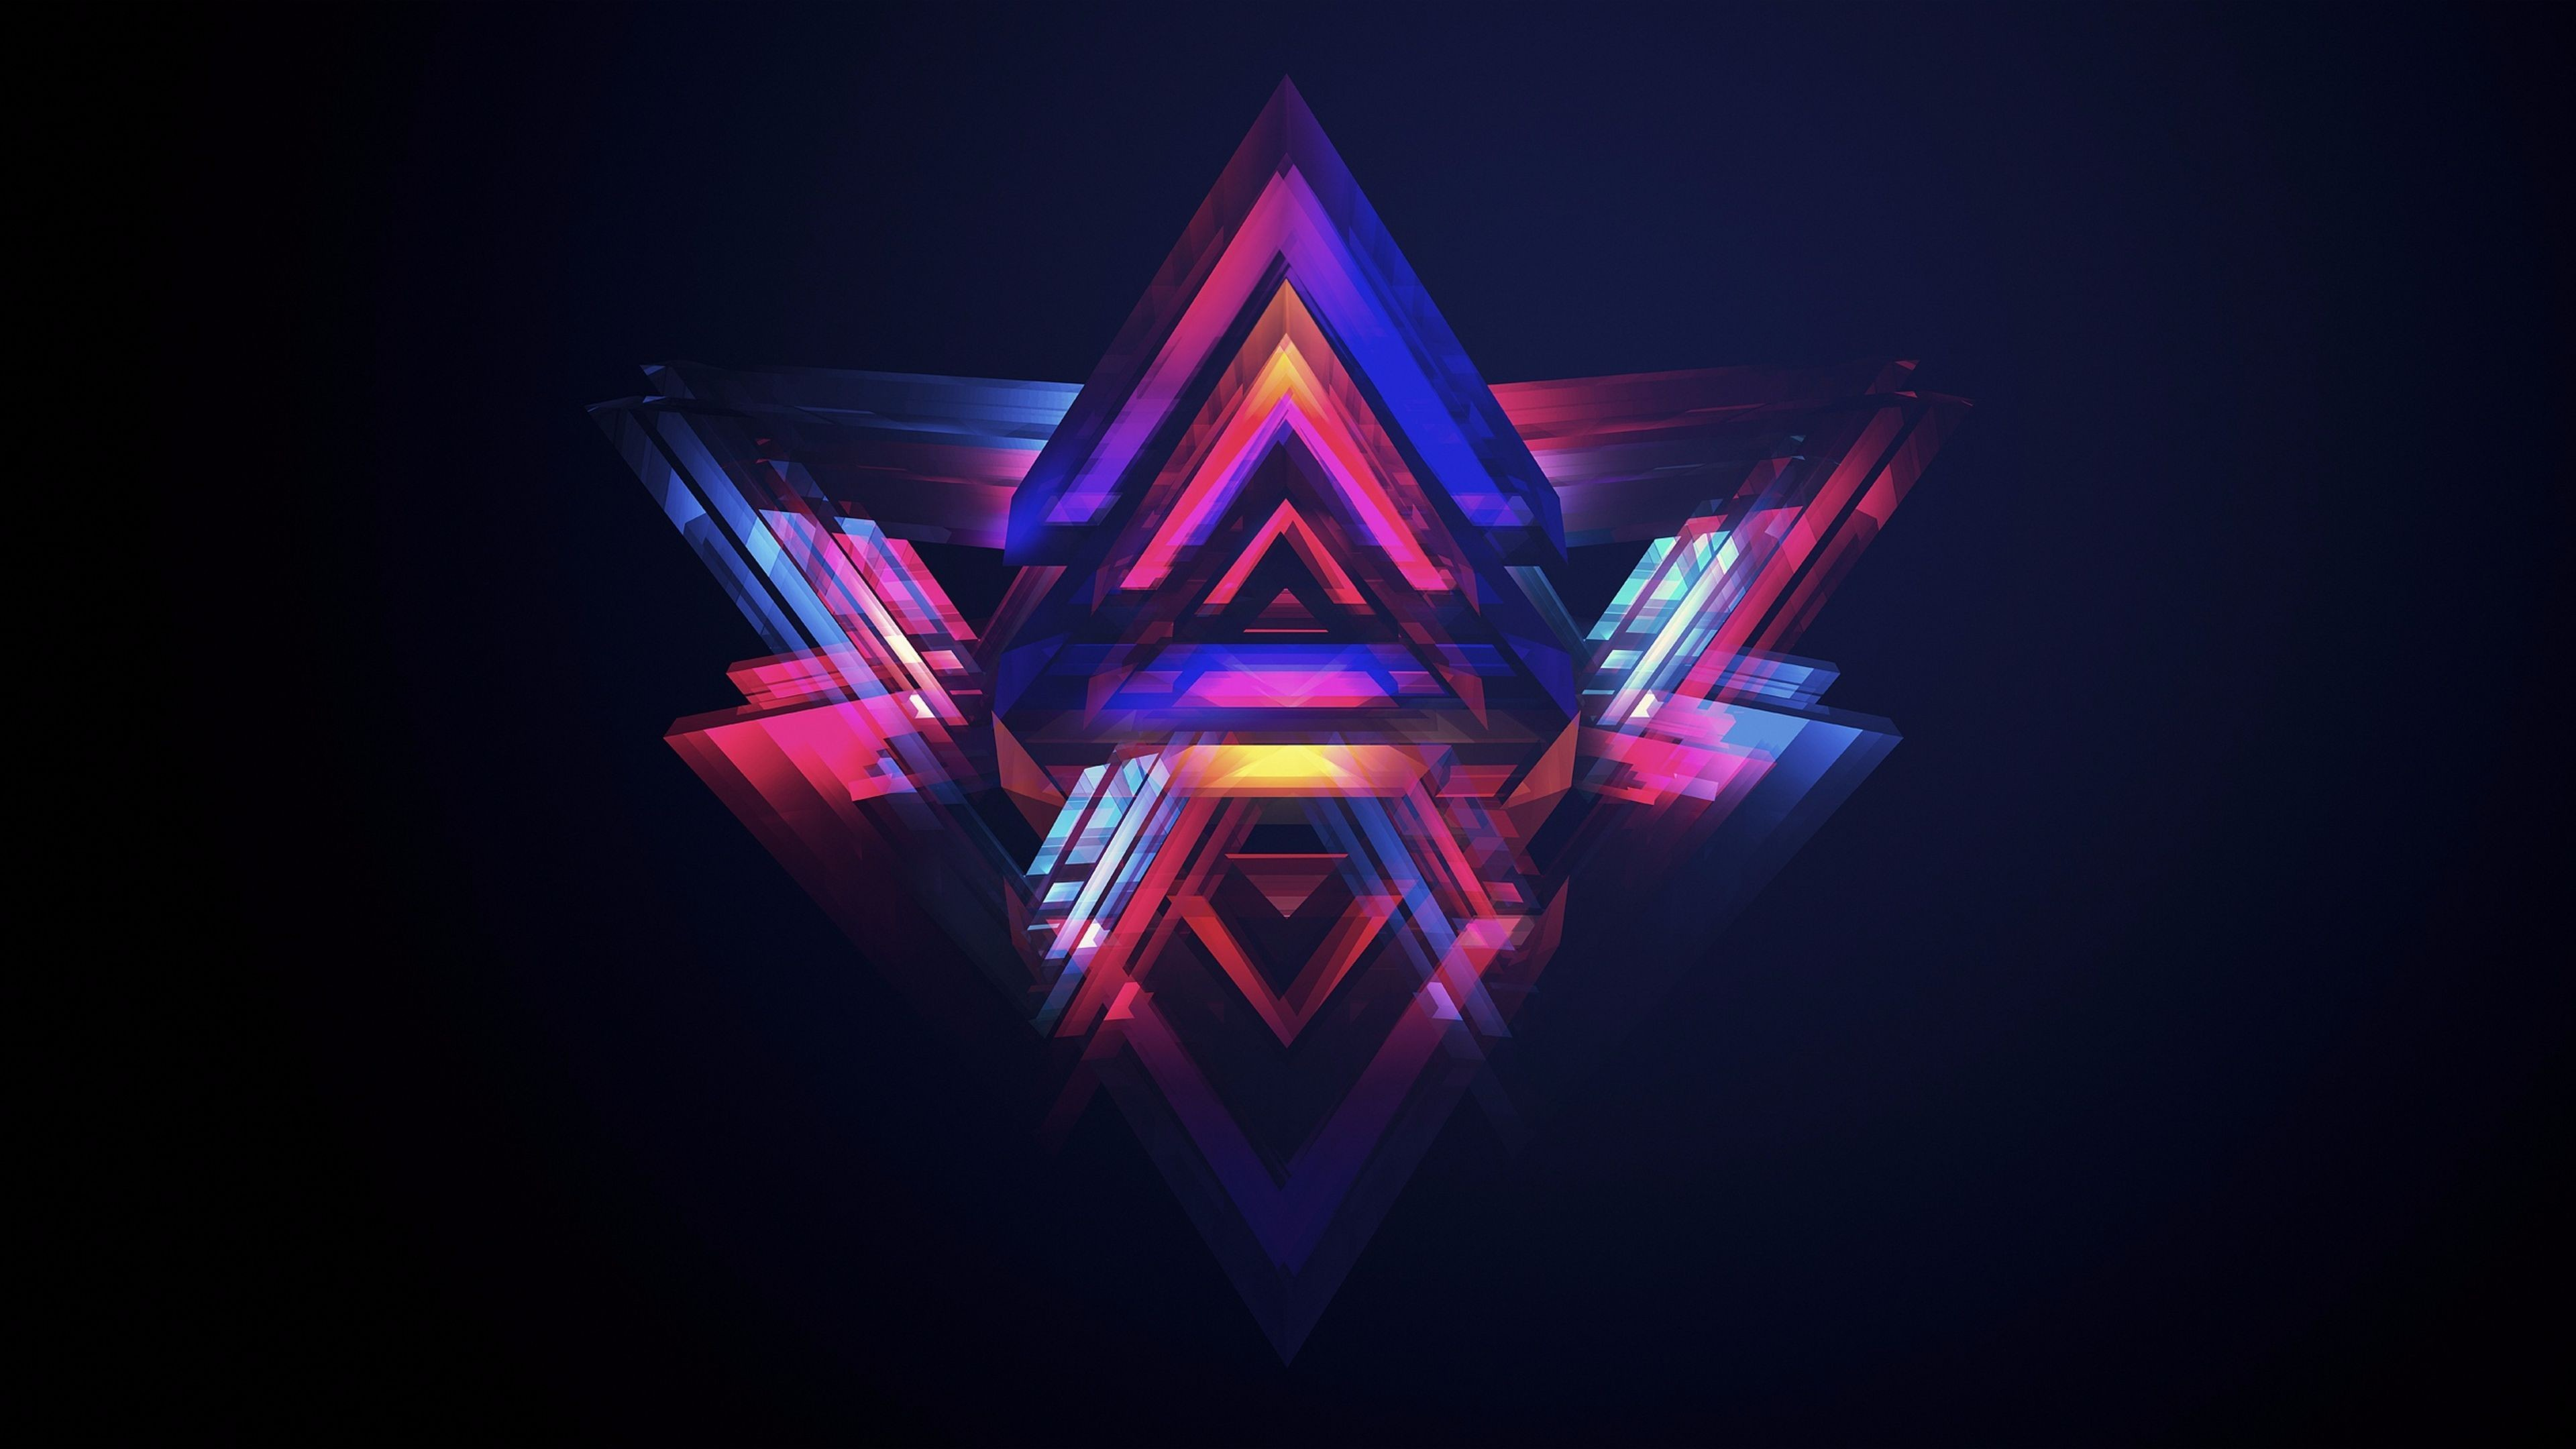 Res: 3840x2160, Colorful-Pyramid-Abstract-4K-Wallpaper.jpg (3840×2160)